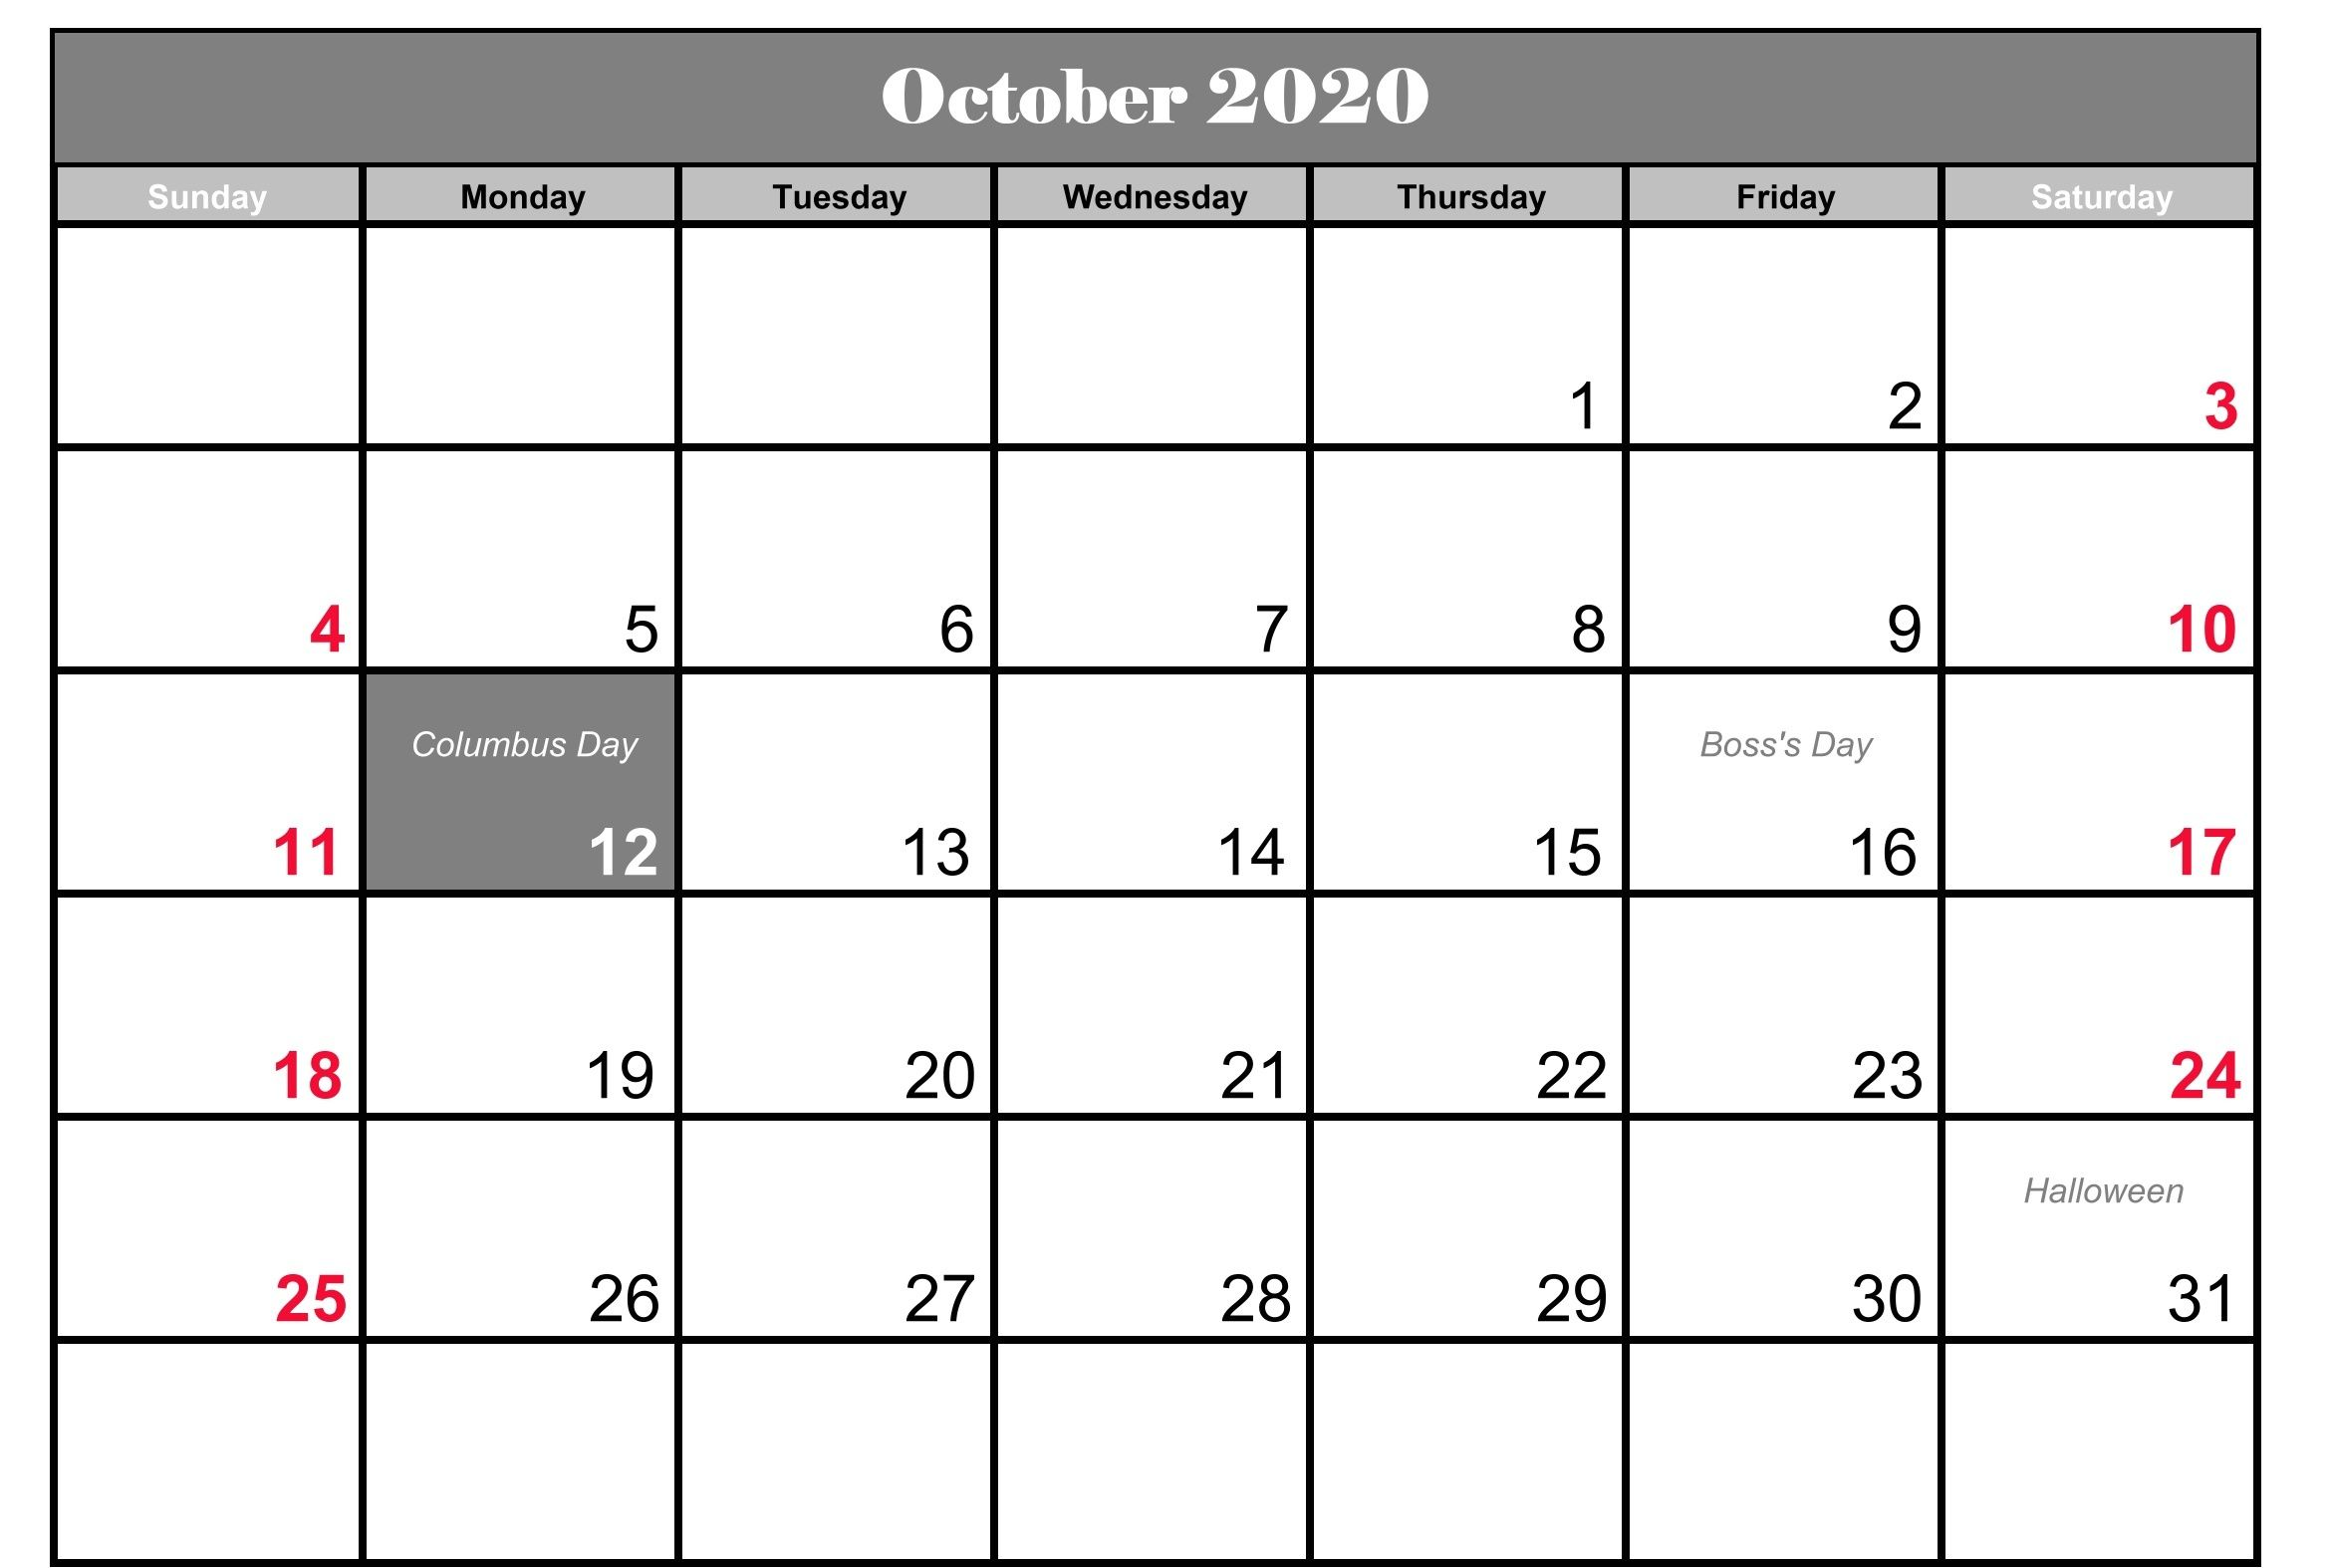 October 2020 Holidays Calendar Template Calendar